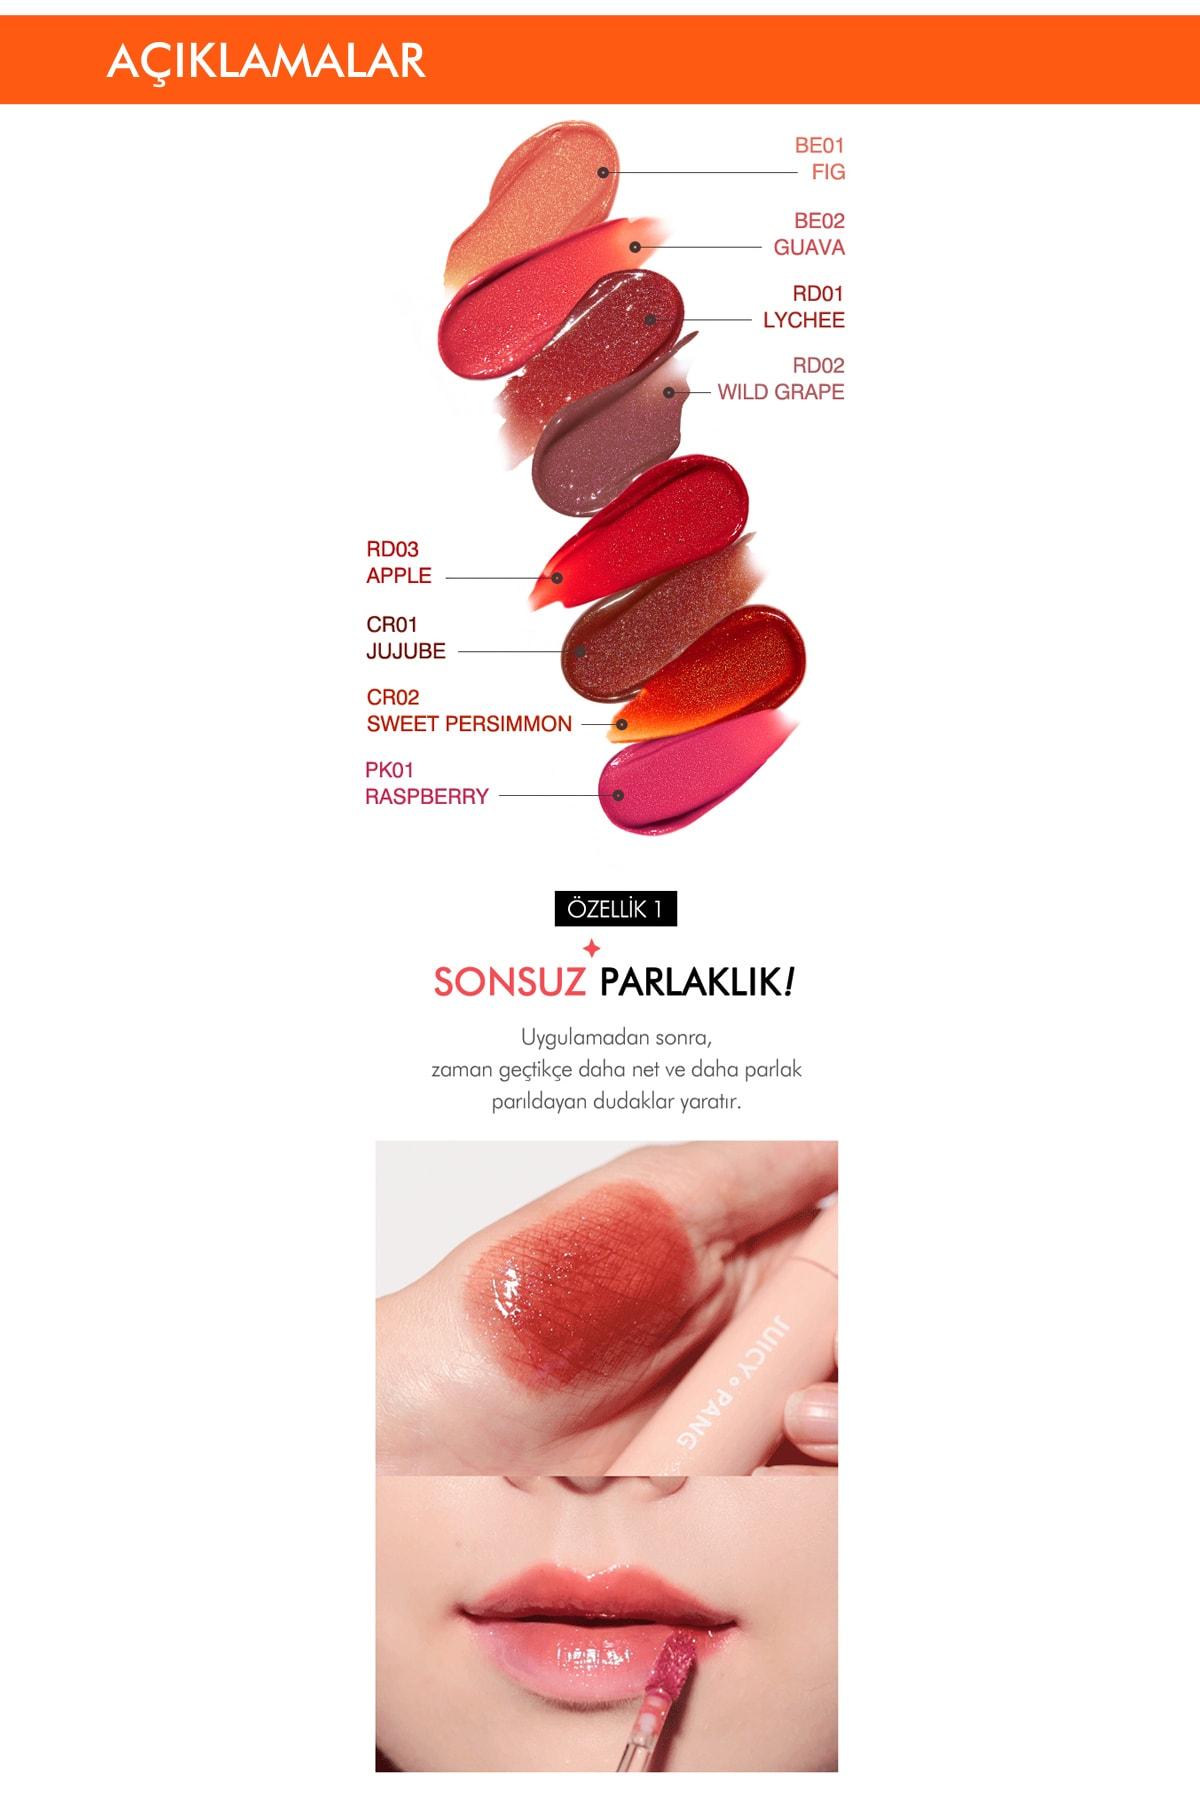 Missha Işıltı&Dolgunluk Veren  Parlak Gloss Tint APIEU Juicy-Pang Sparkling Tint CR01 3